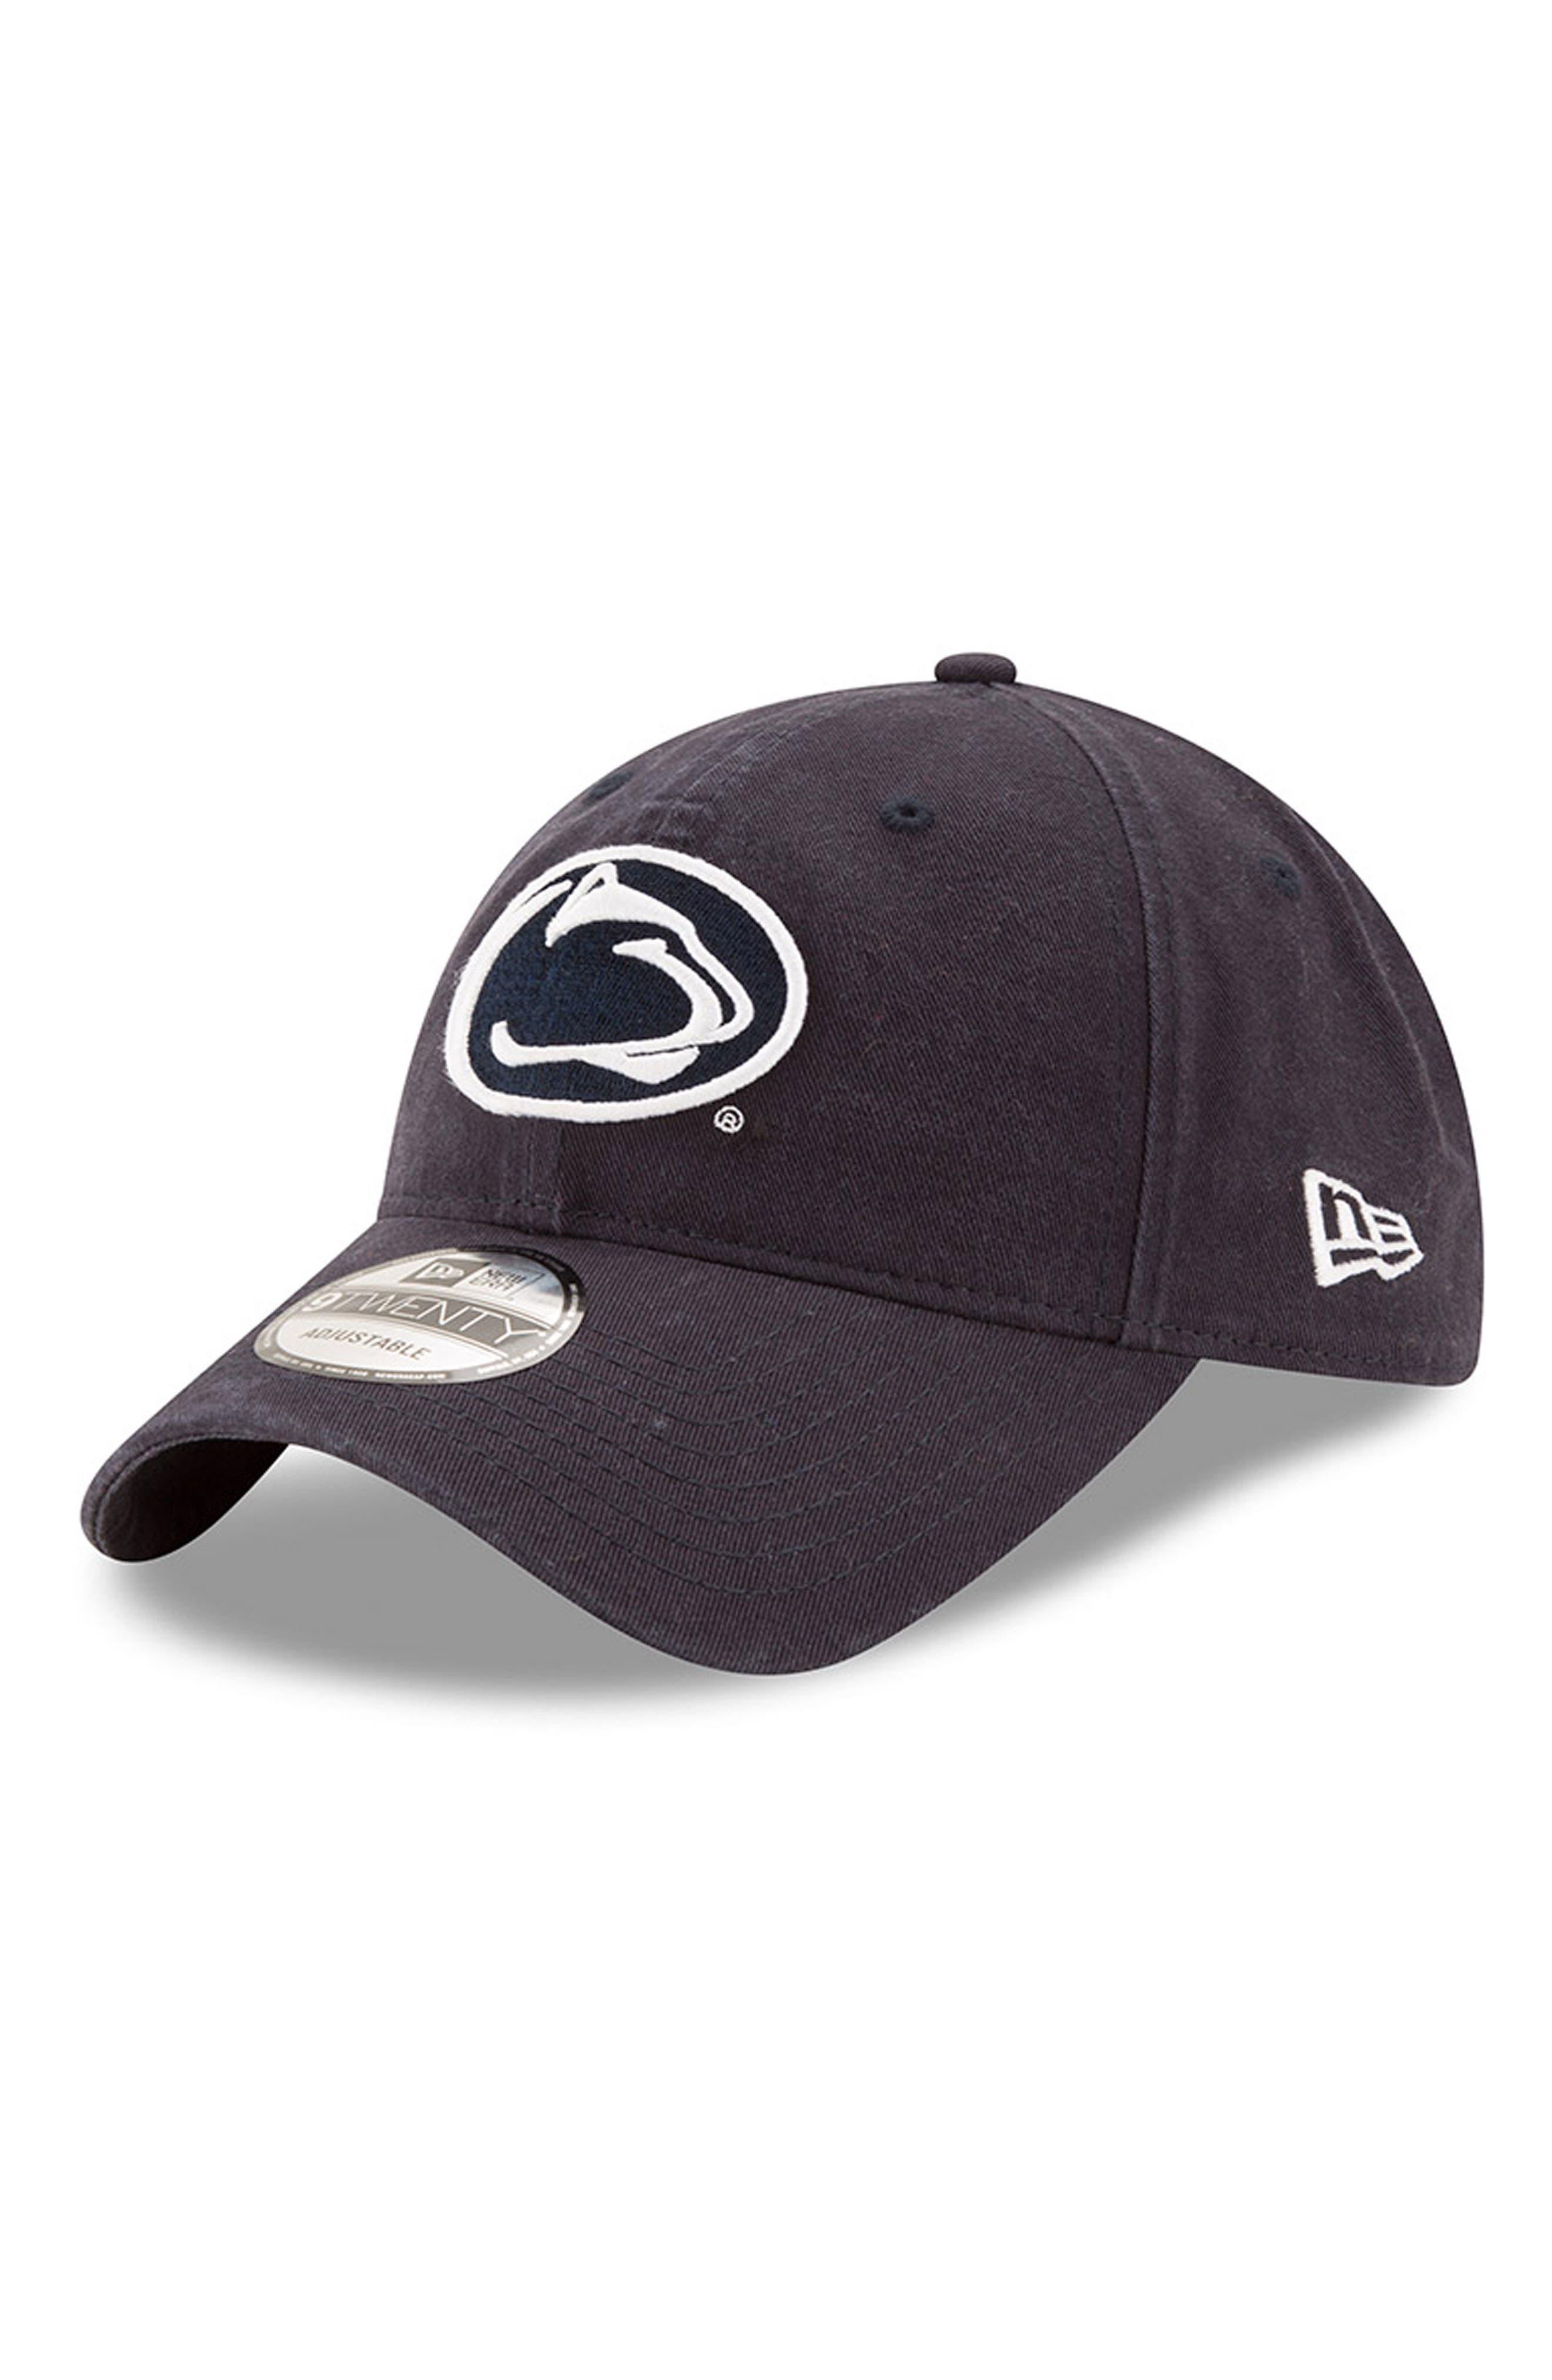 New Era Collegiate Core Classic - Penn State Nittany Lions Baseball Cap,                         Main,                         color,